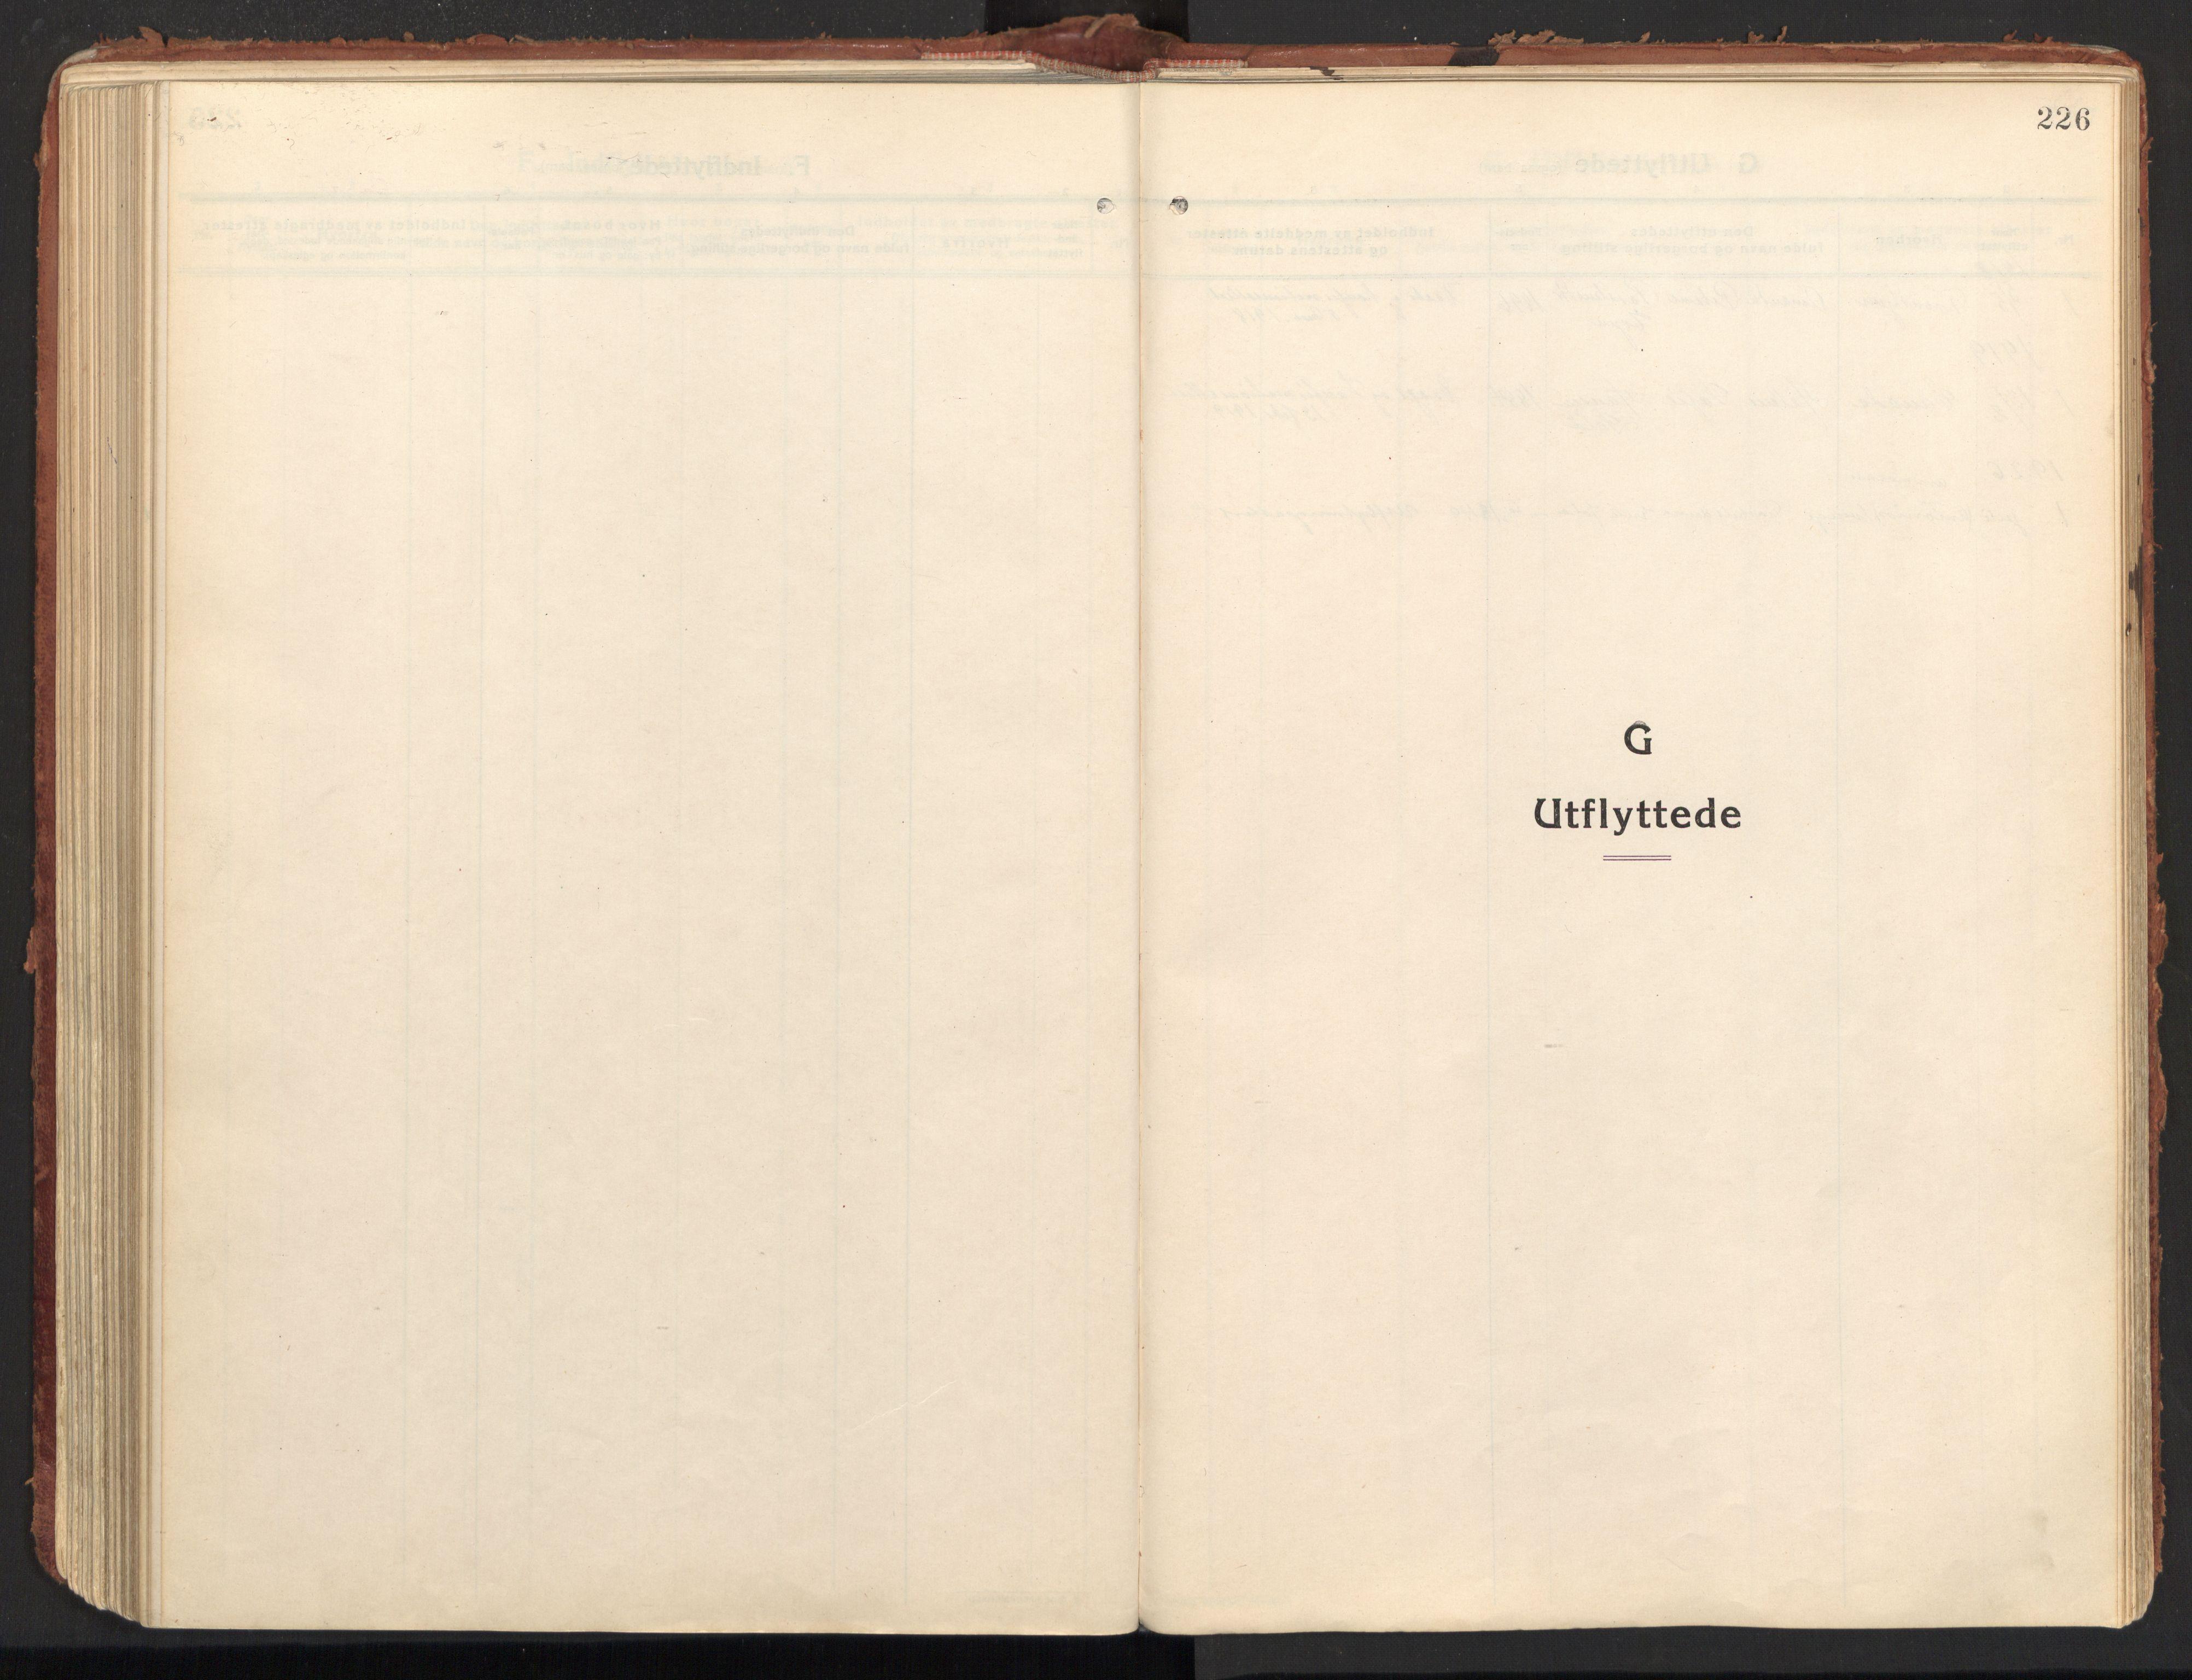 SAT, Ministerialprotokoller, klokkerbøker og fødselsregistre - Nordland, 846/L0650: Ministerialbok nr. 846A08, 1916-1935, s. 226